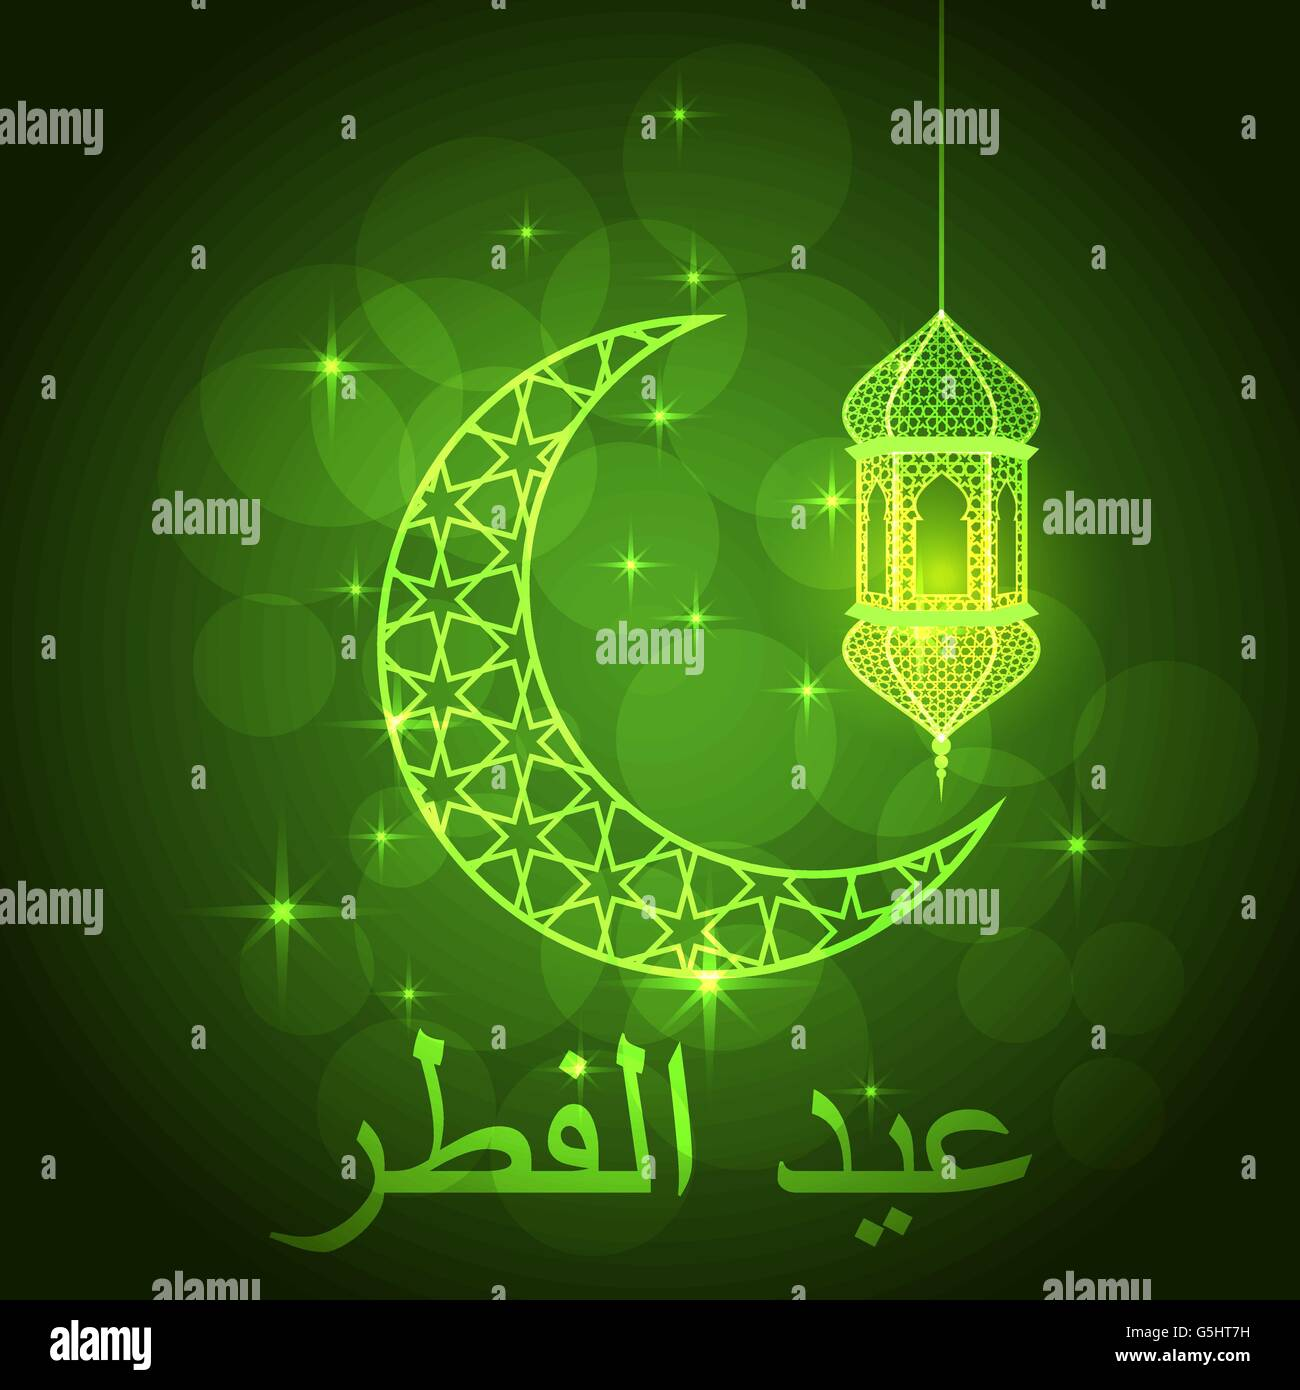 Eid al fitr greeting stock vector art illustration vector image eid al fitr greeting m4hsunfo